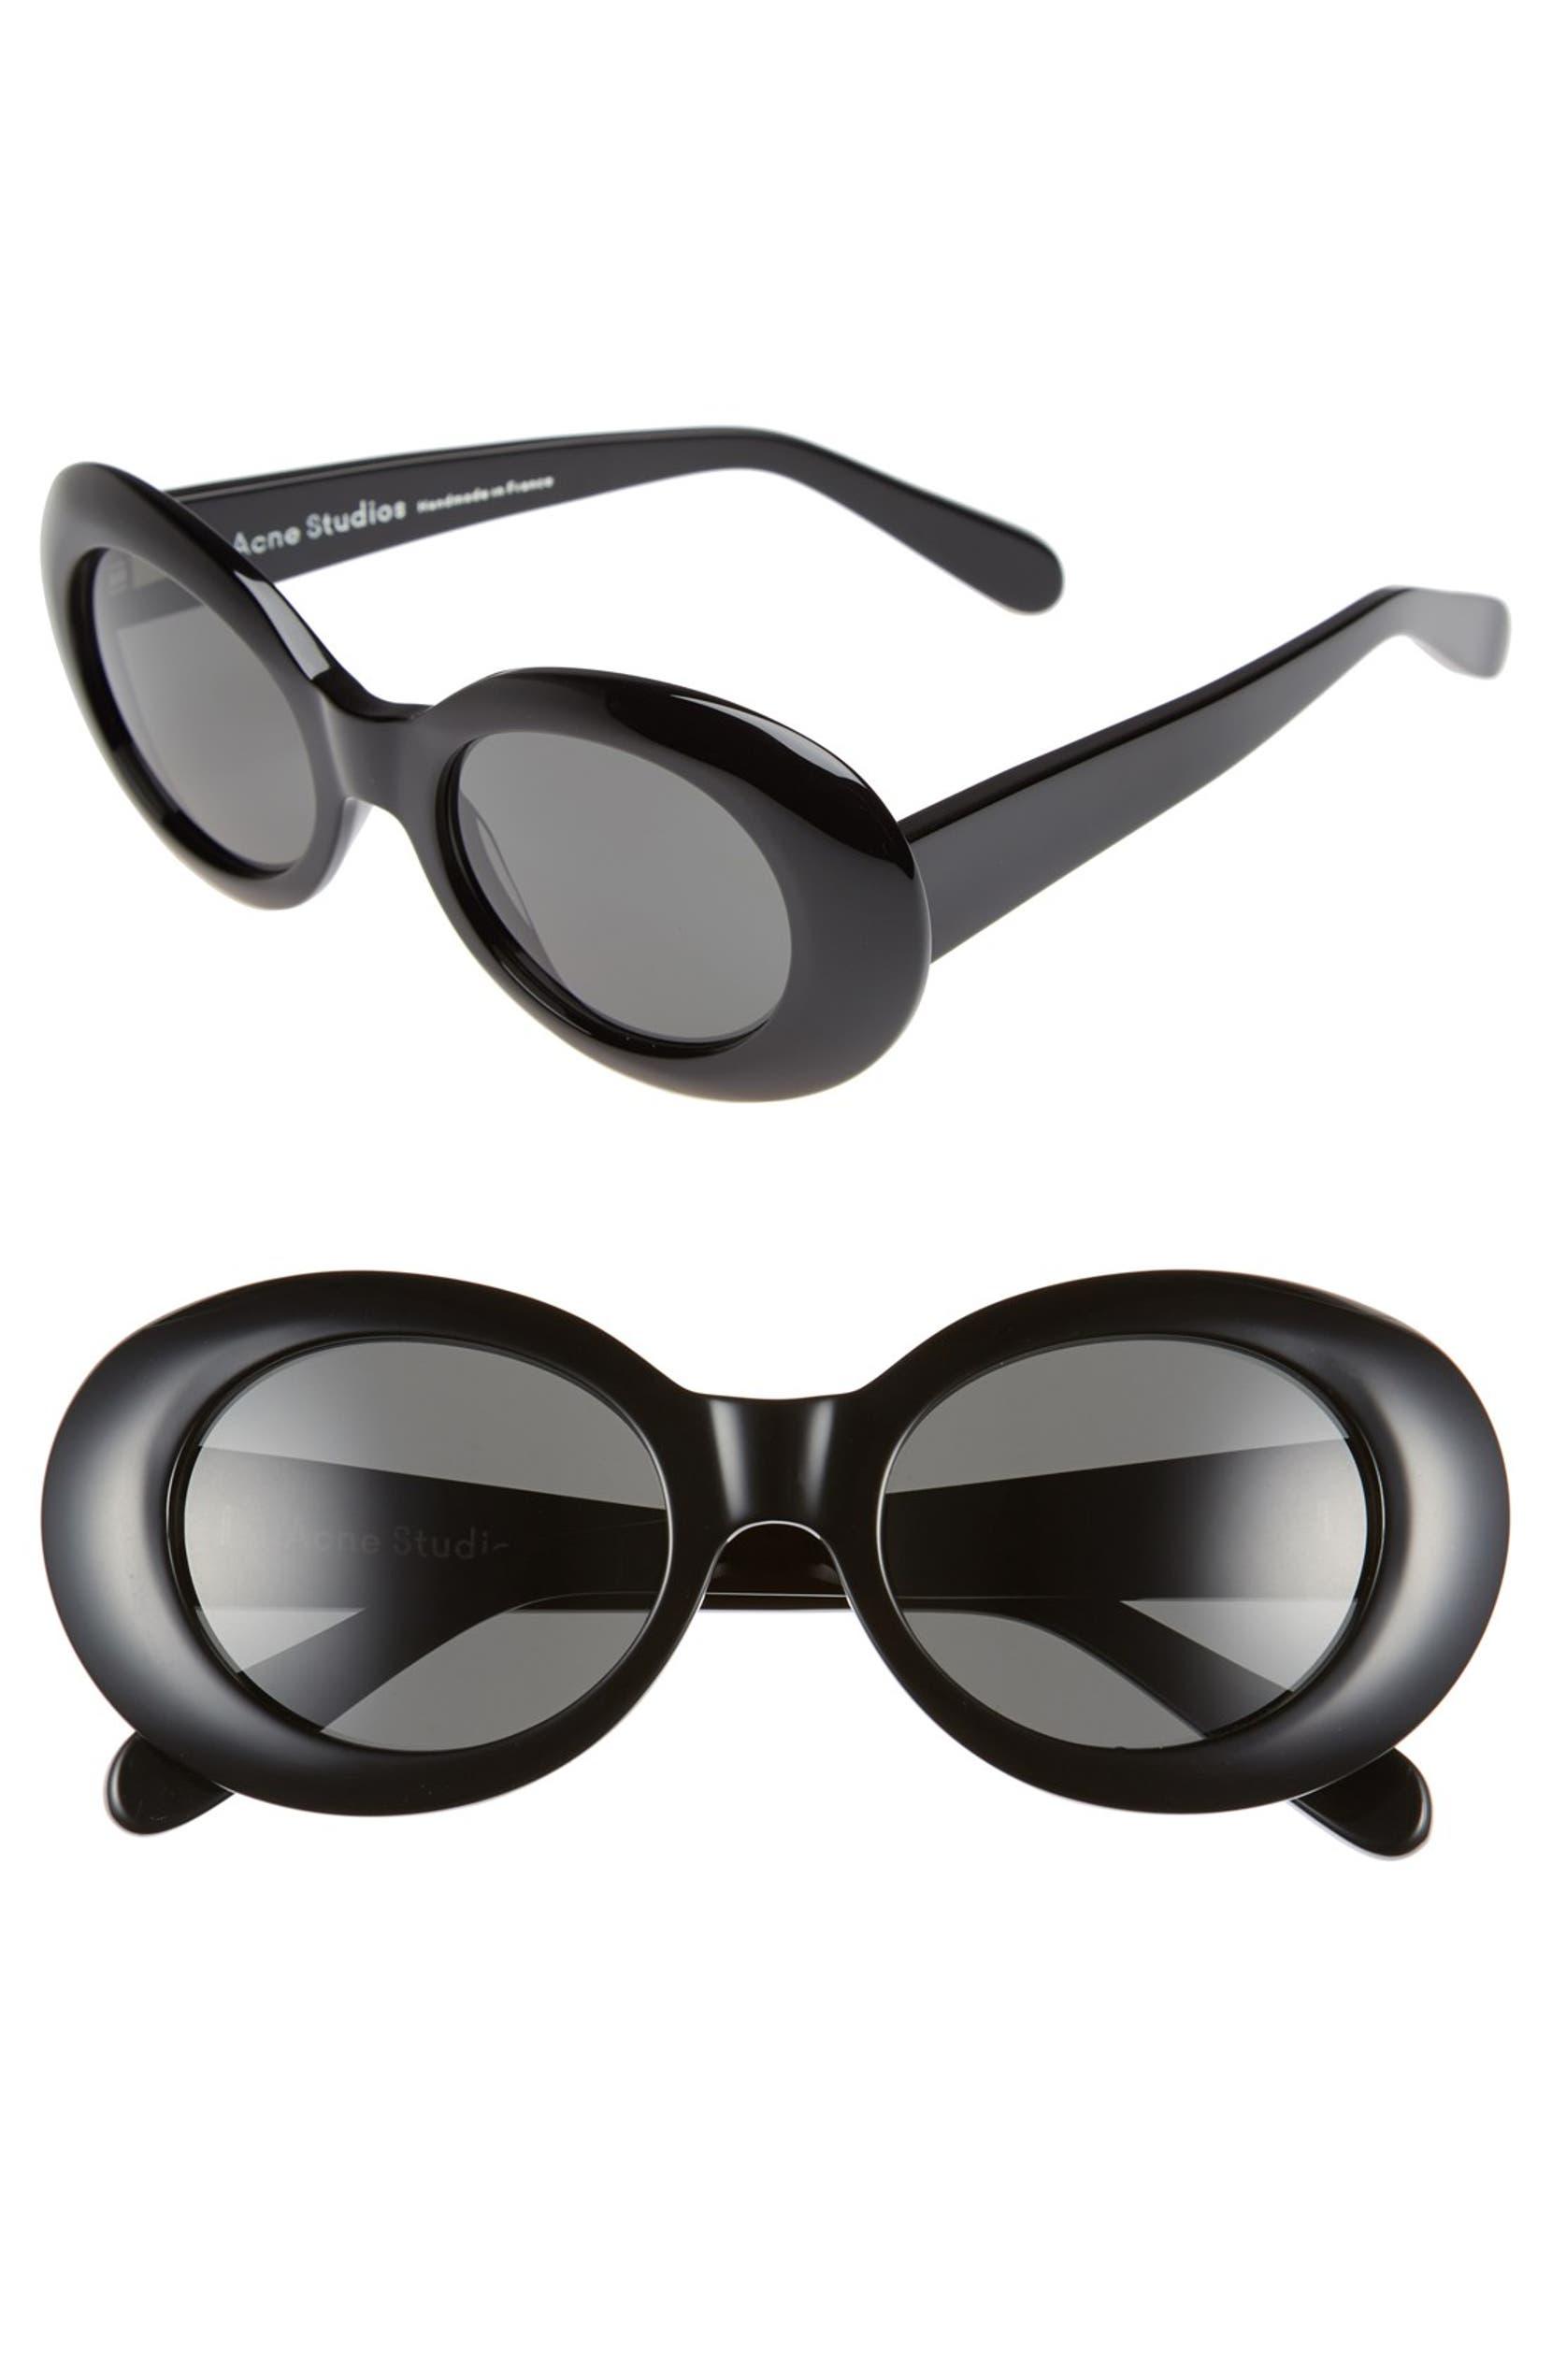 12ba0205f54a Acne Studios Mustang 49mm Oval Sunglasses